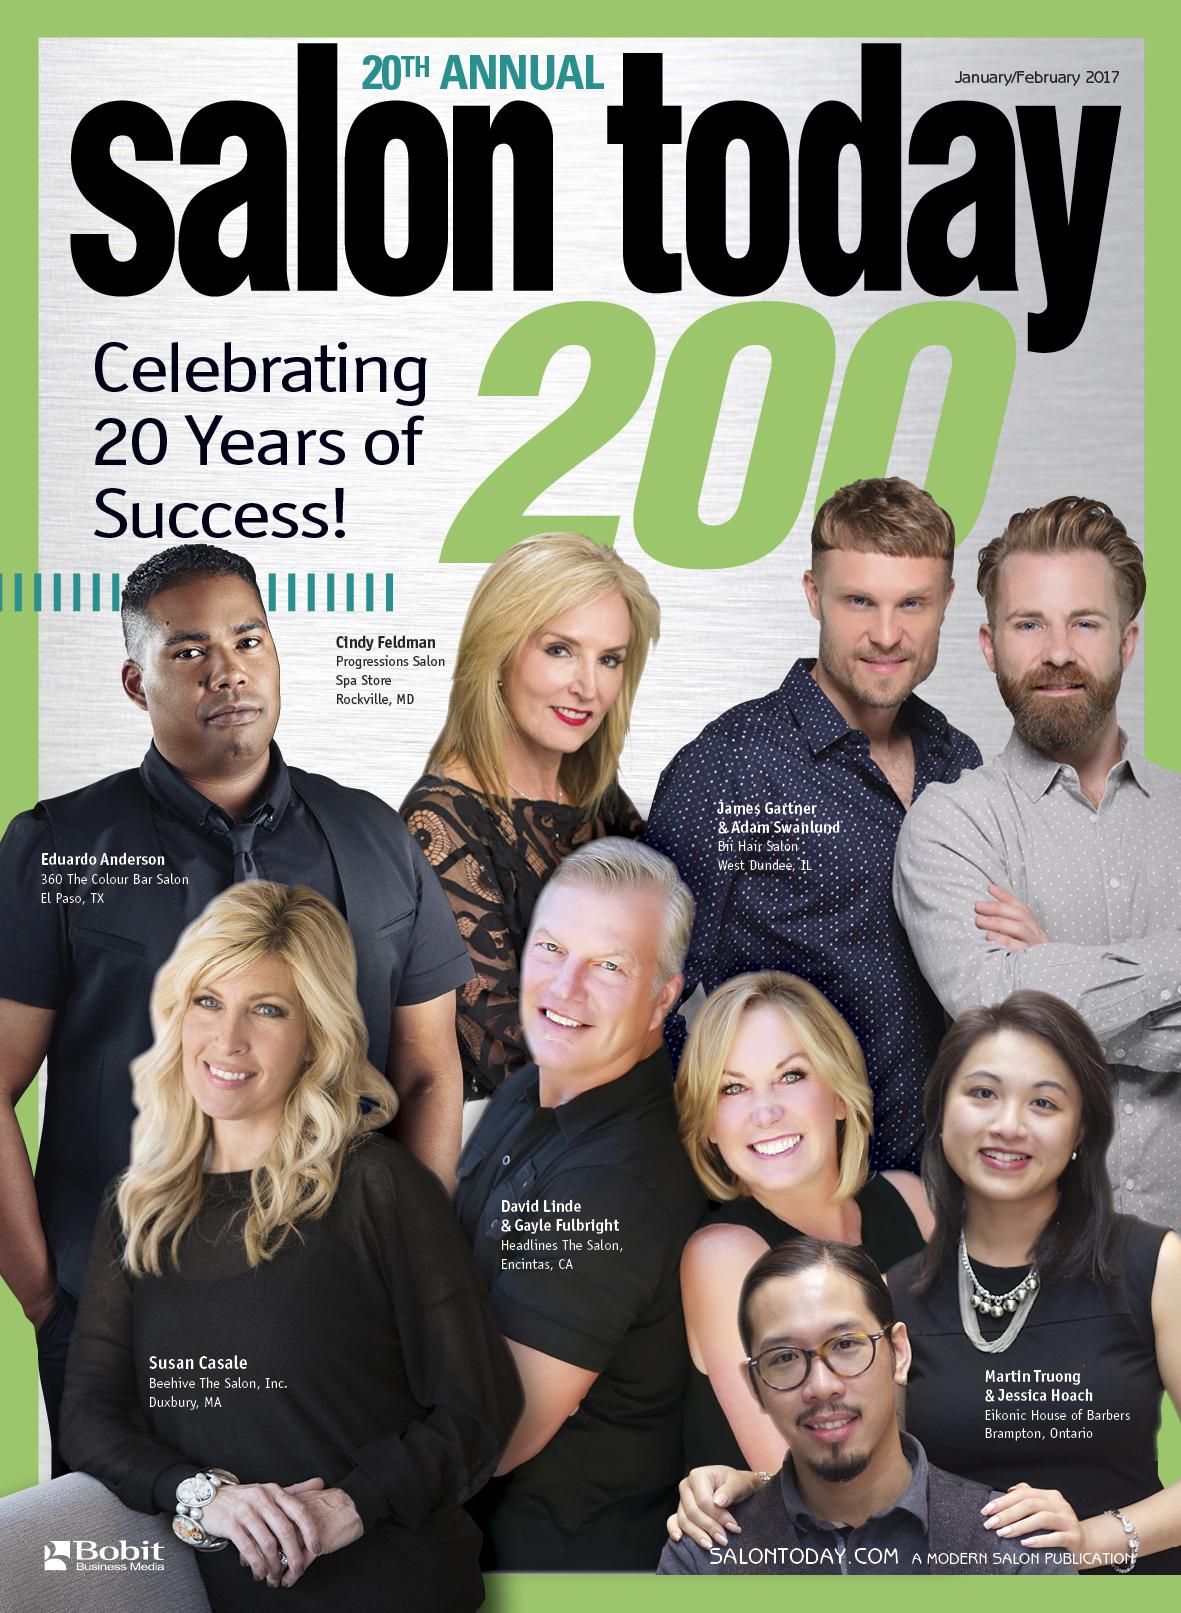 Salon Today 200 Announces Profit Center—Its Newest Competition Category